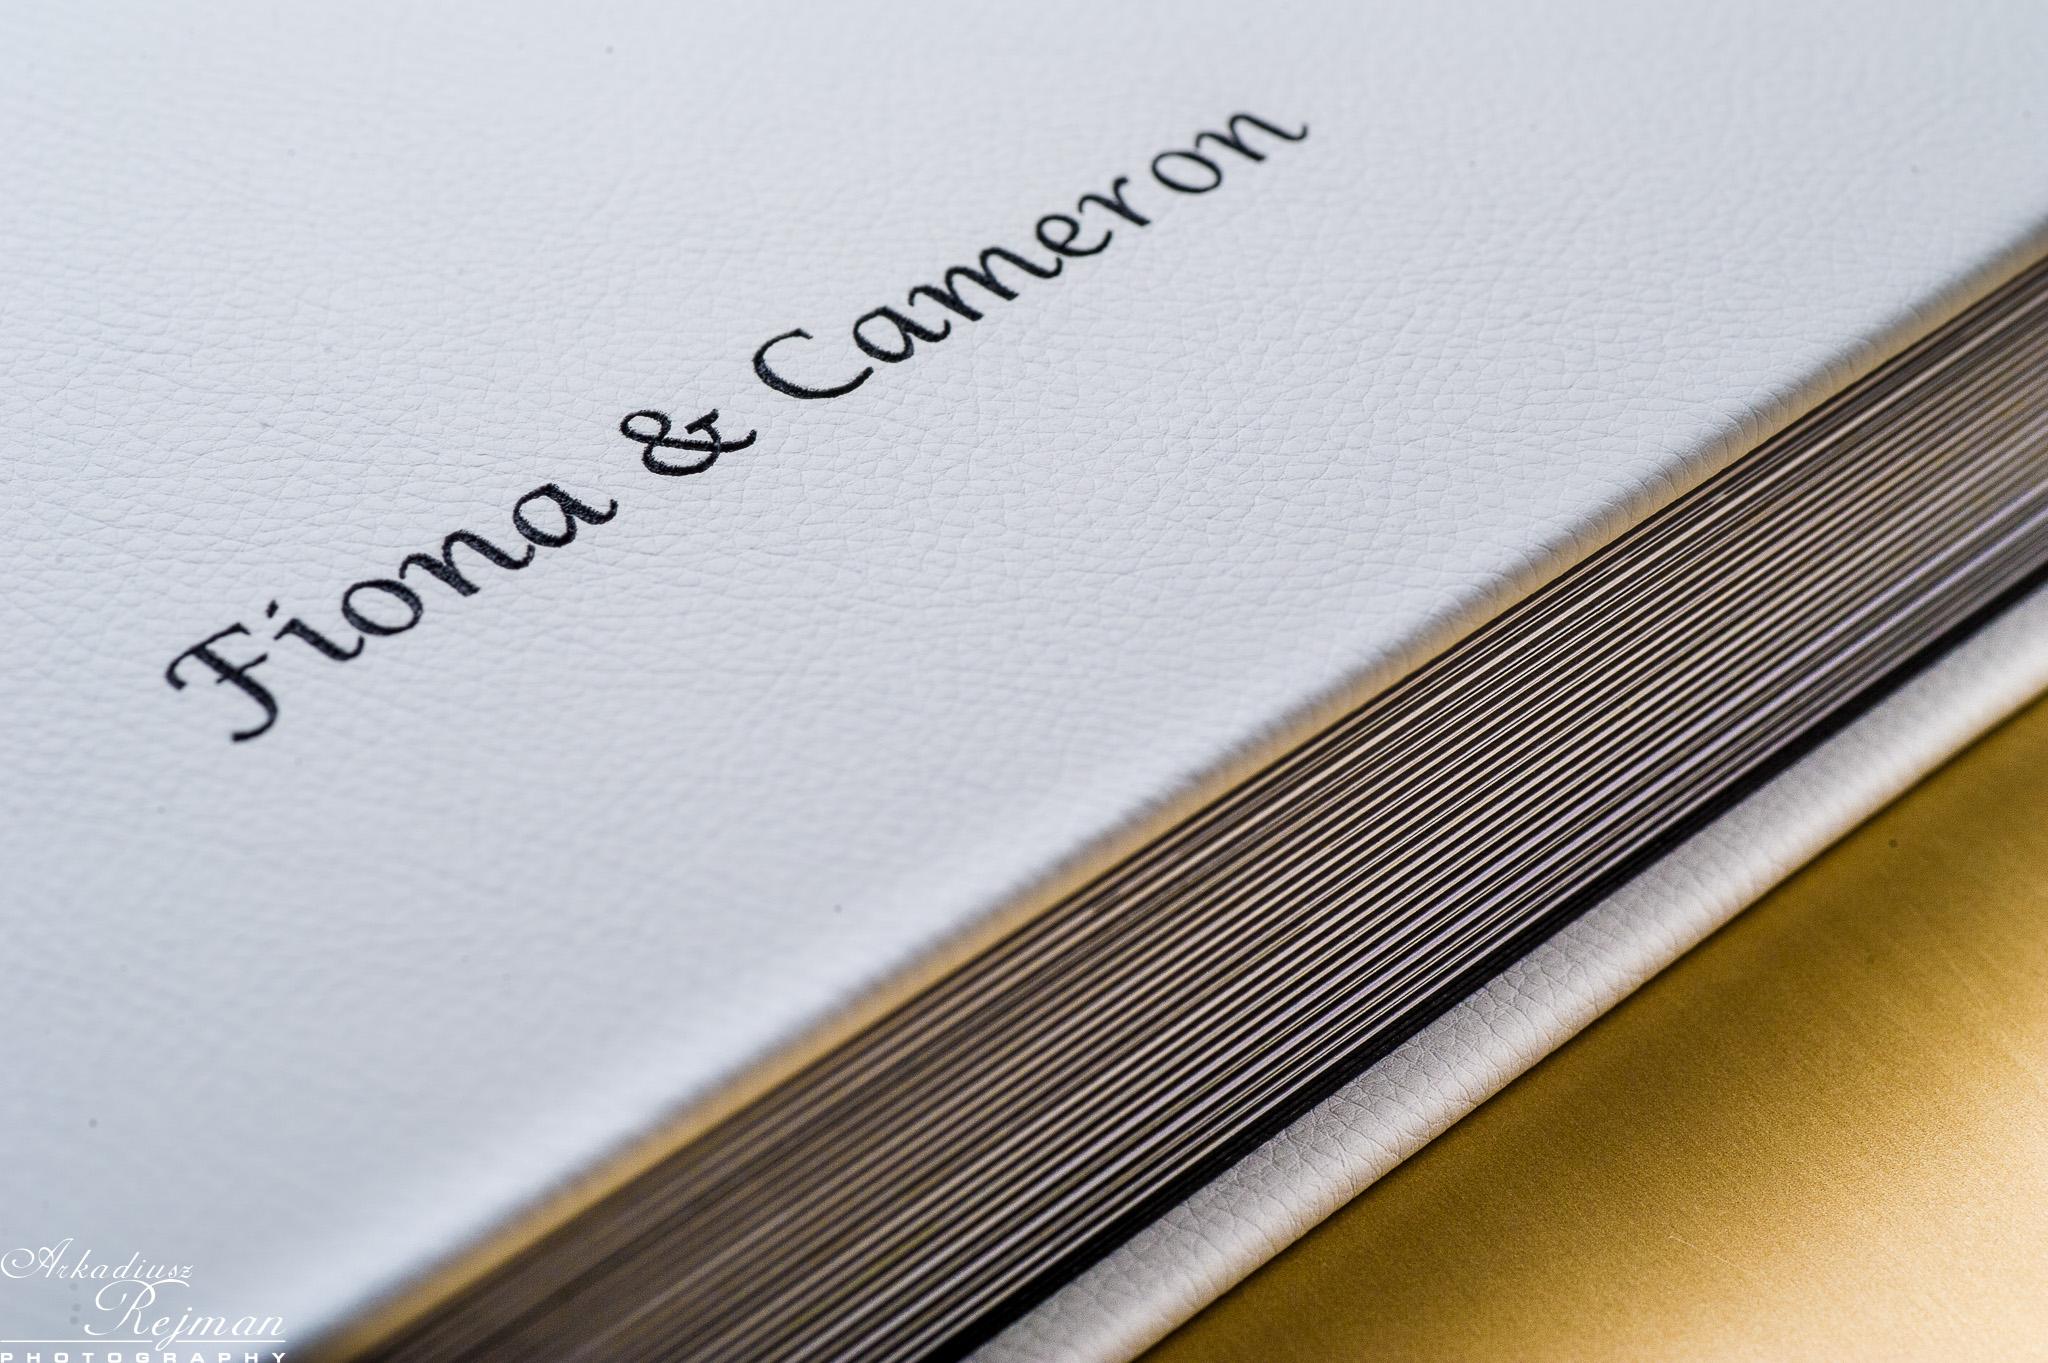 Album-FionaCameron-ProductPhoto-005.jpg